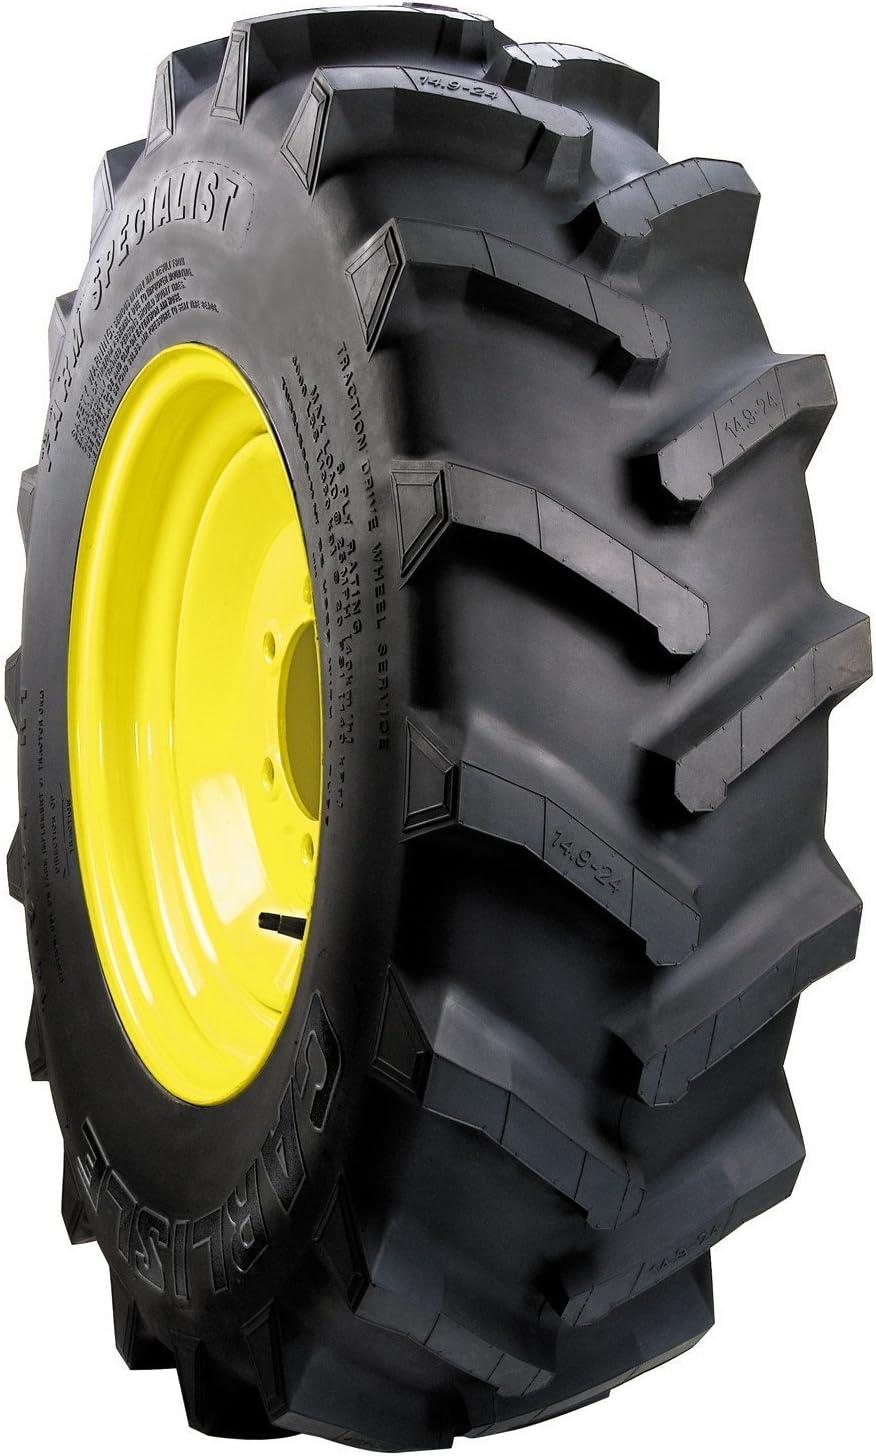 9.5-20 8-Ply Carlisle Farm Specialist R-1 Lawn /& Garden Tire